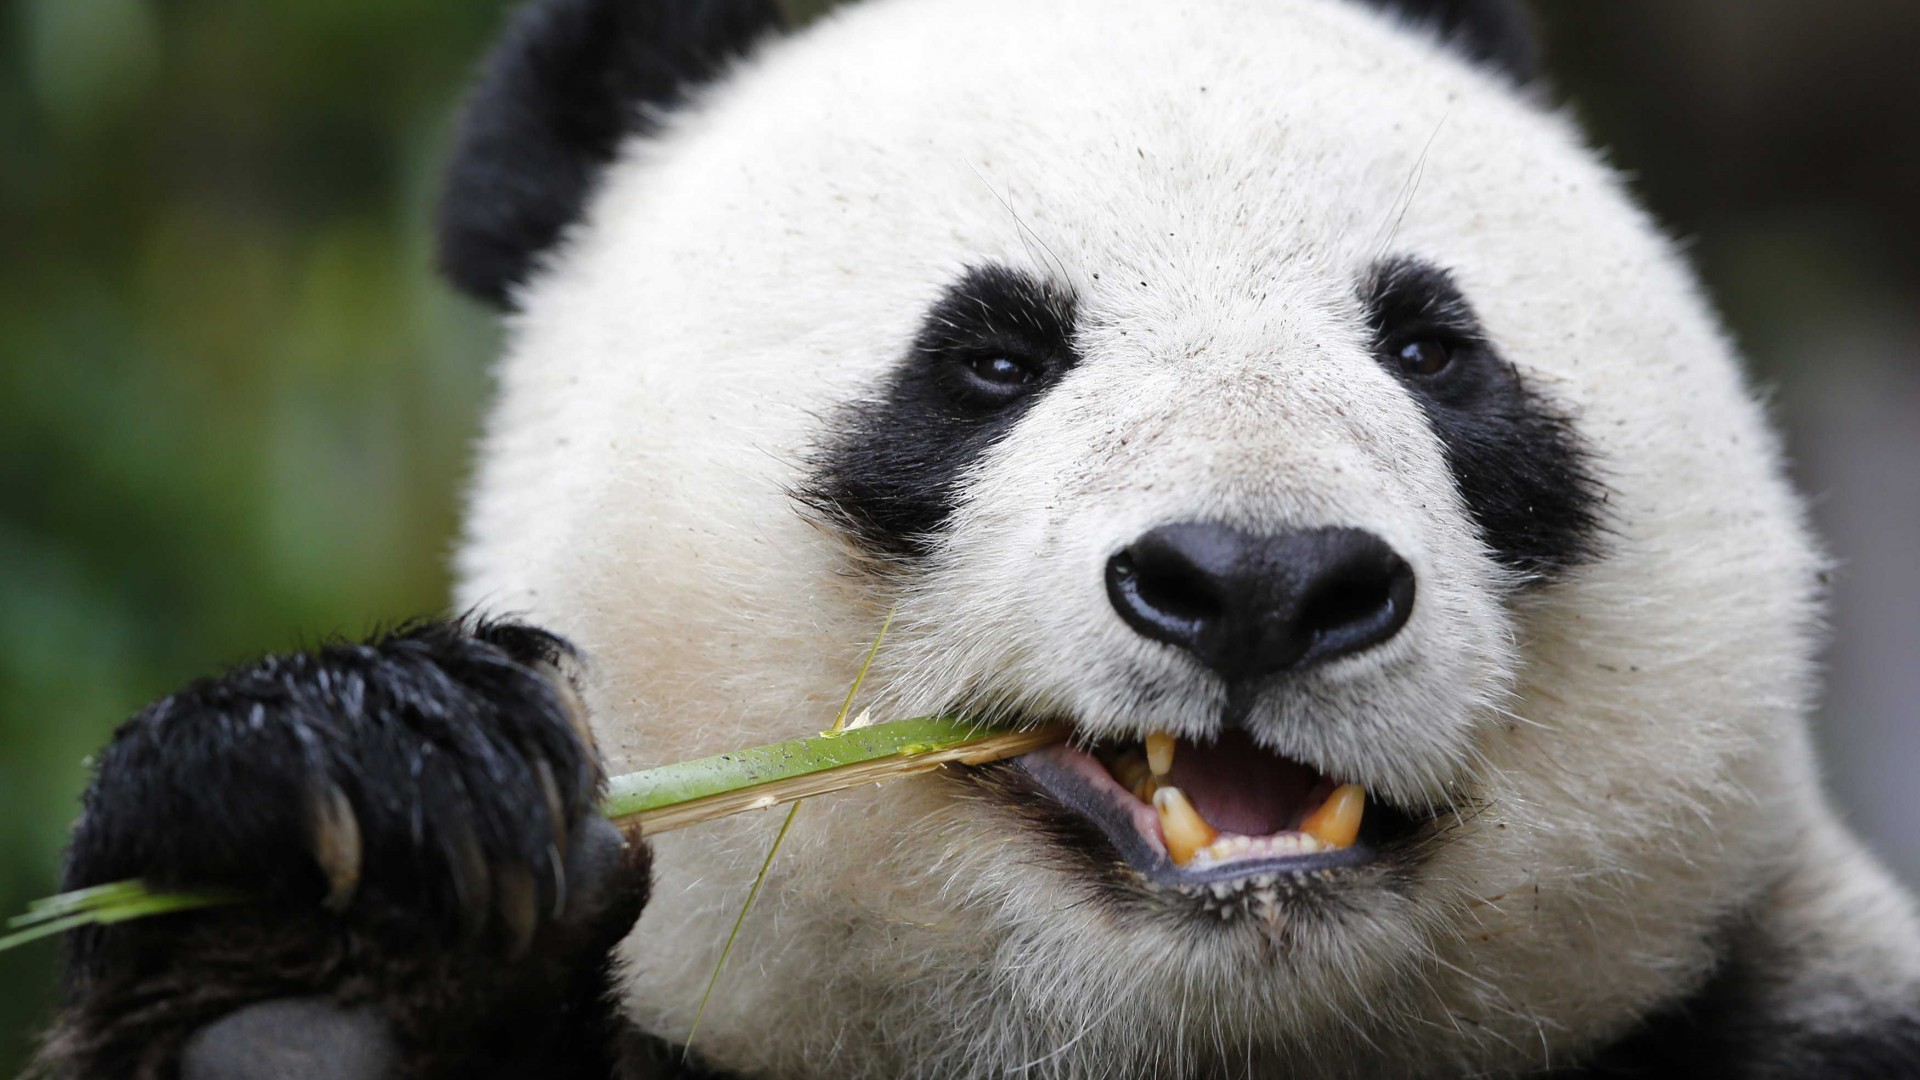 Wallpaper Panda, Giant Panda Zoo, Cute animals, Animals #3935